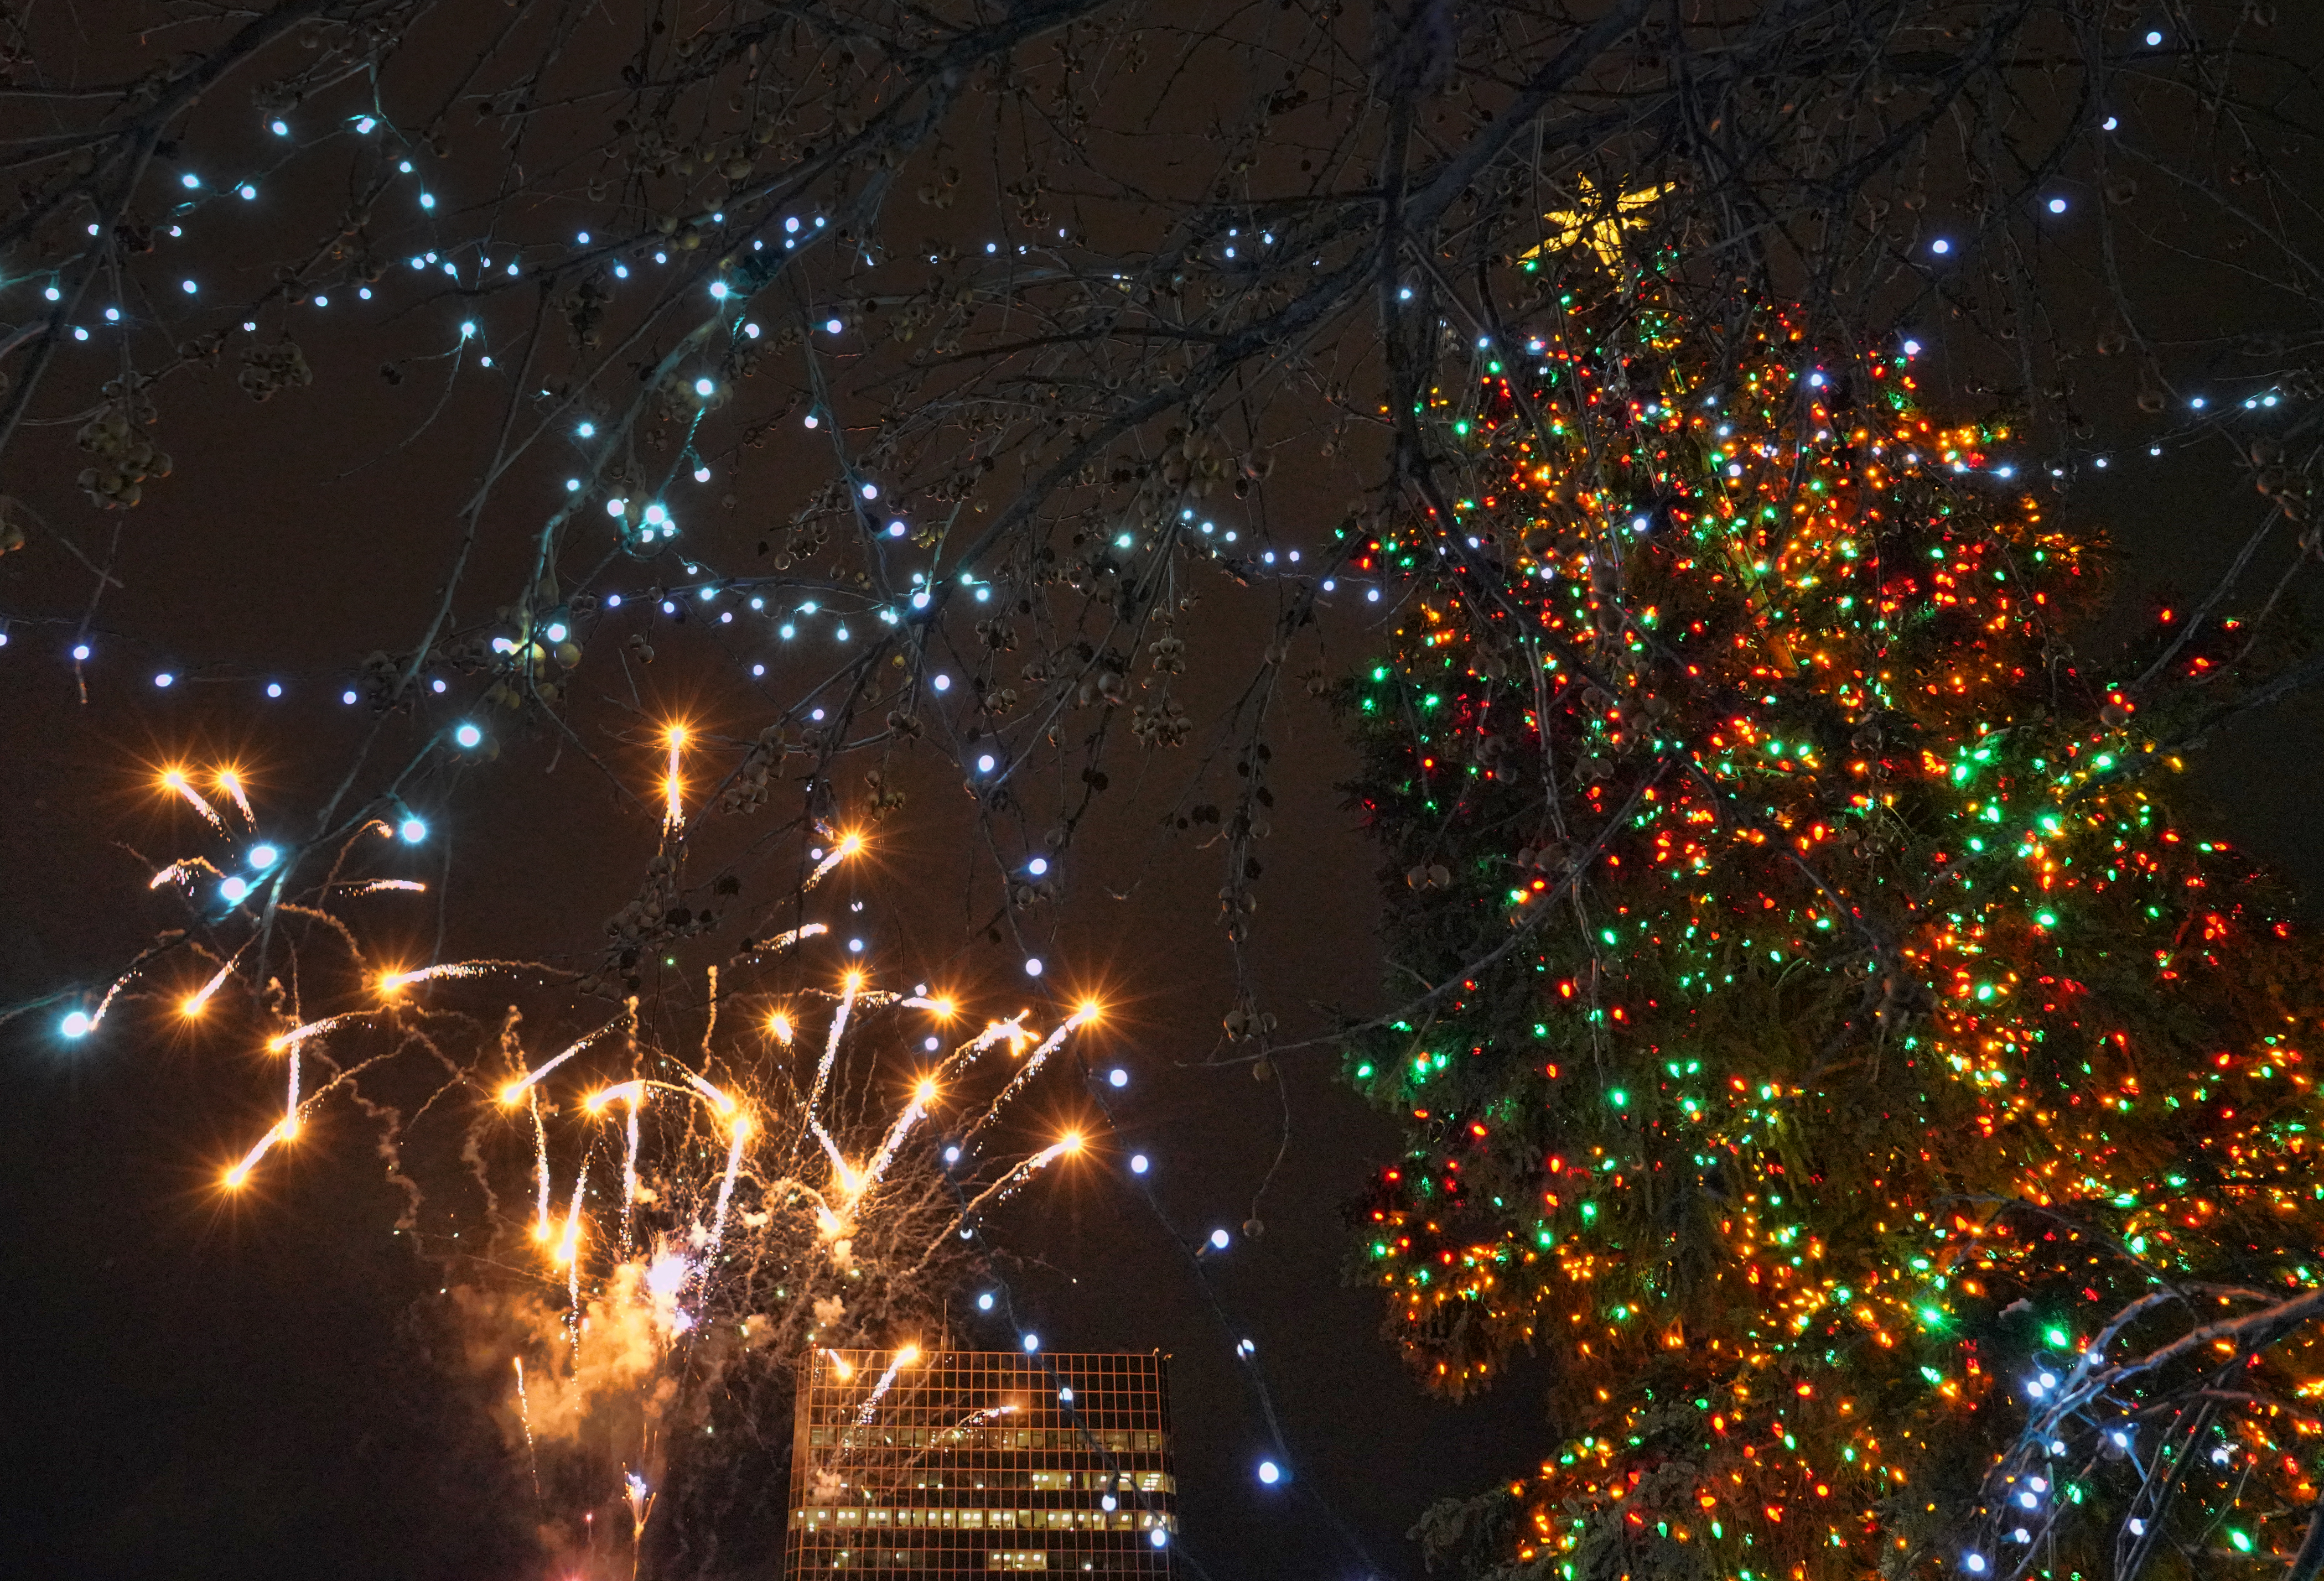 ak fireworks 14 - Photo credit Ralph Radford